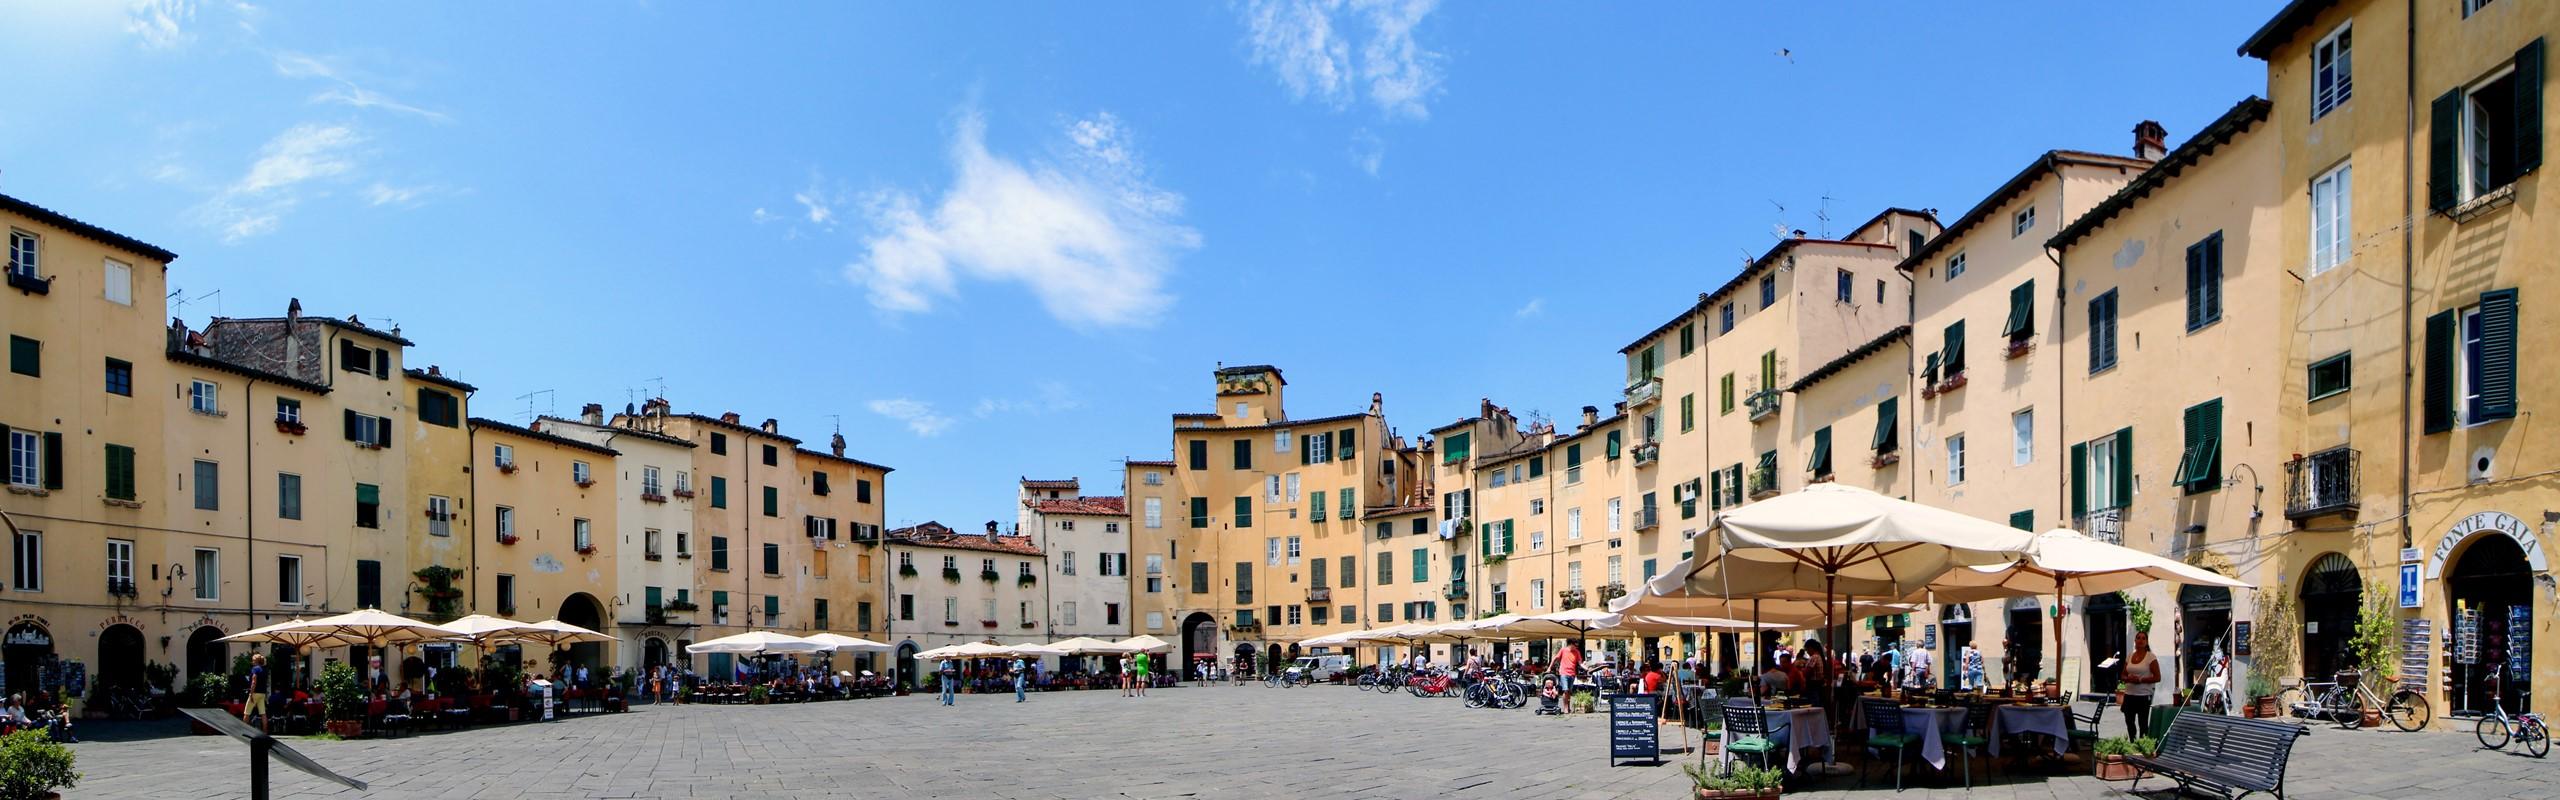 Lucca 1097366